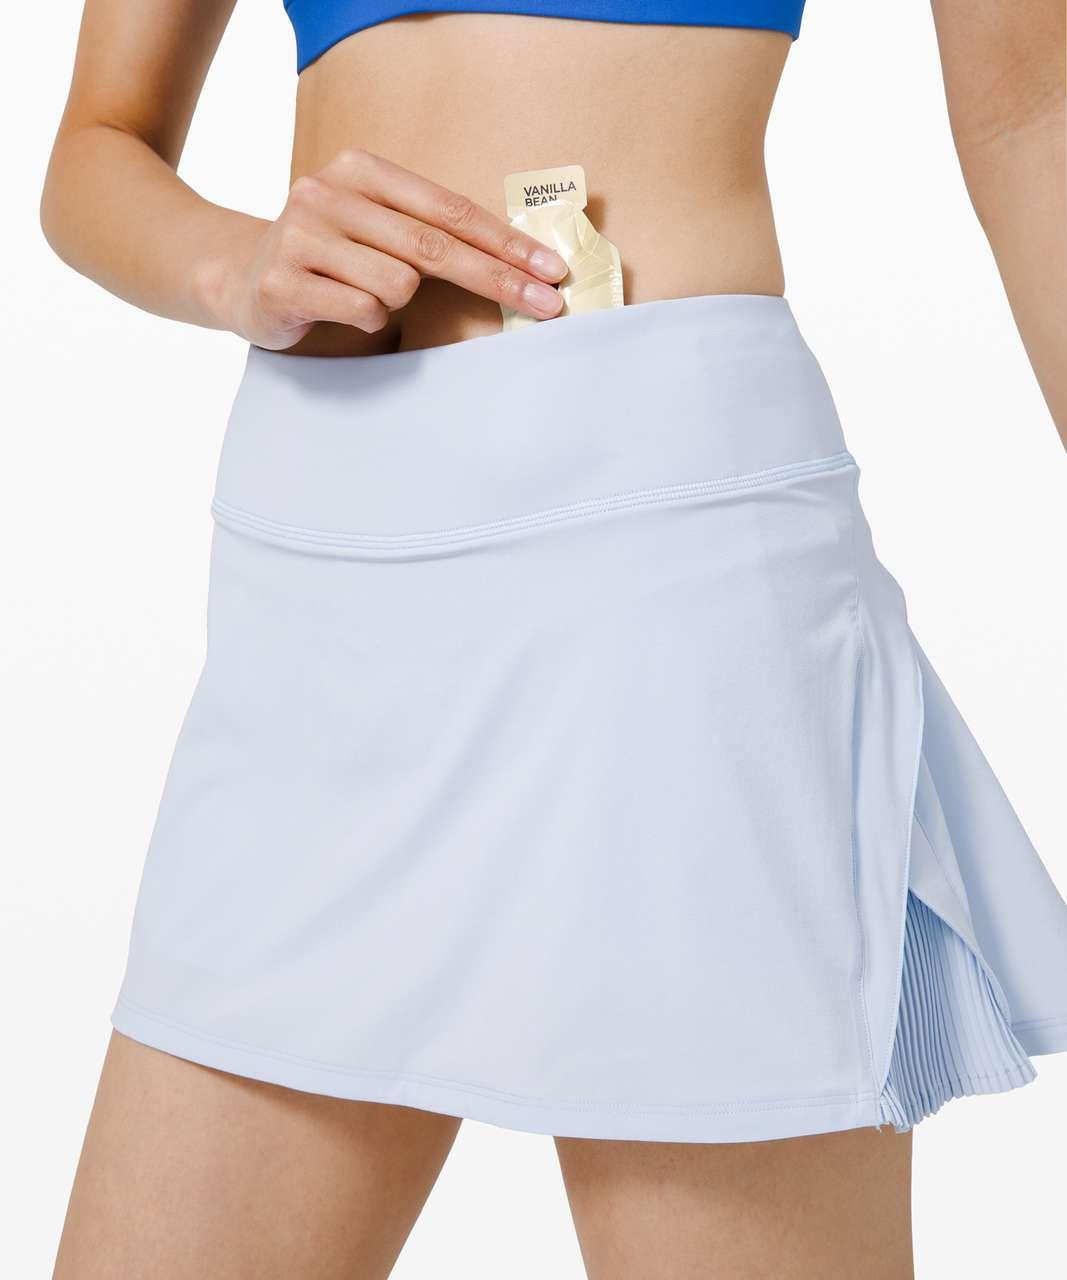 "Lululemon Play Off The Pleats Skirt *13"" - Daydream"